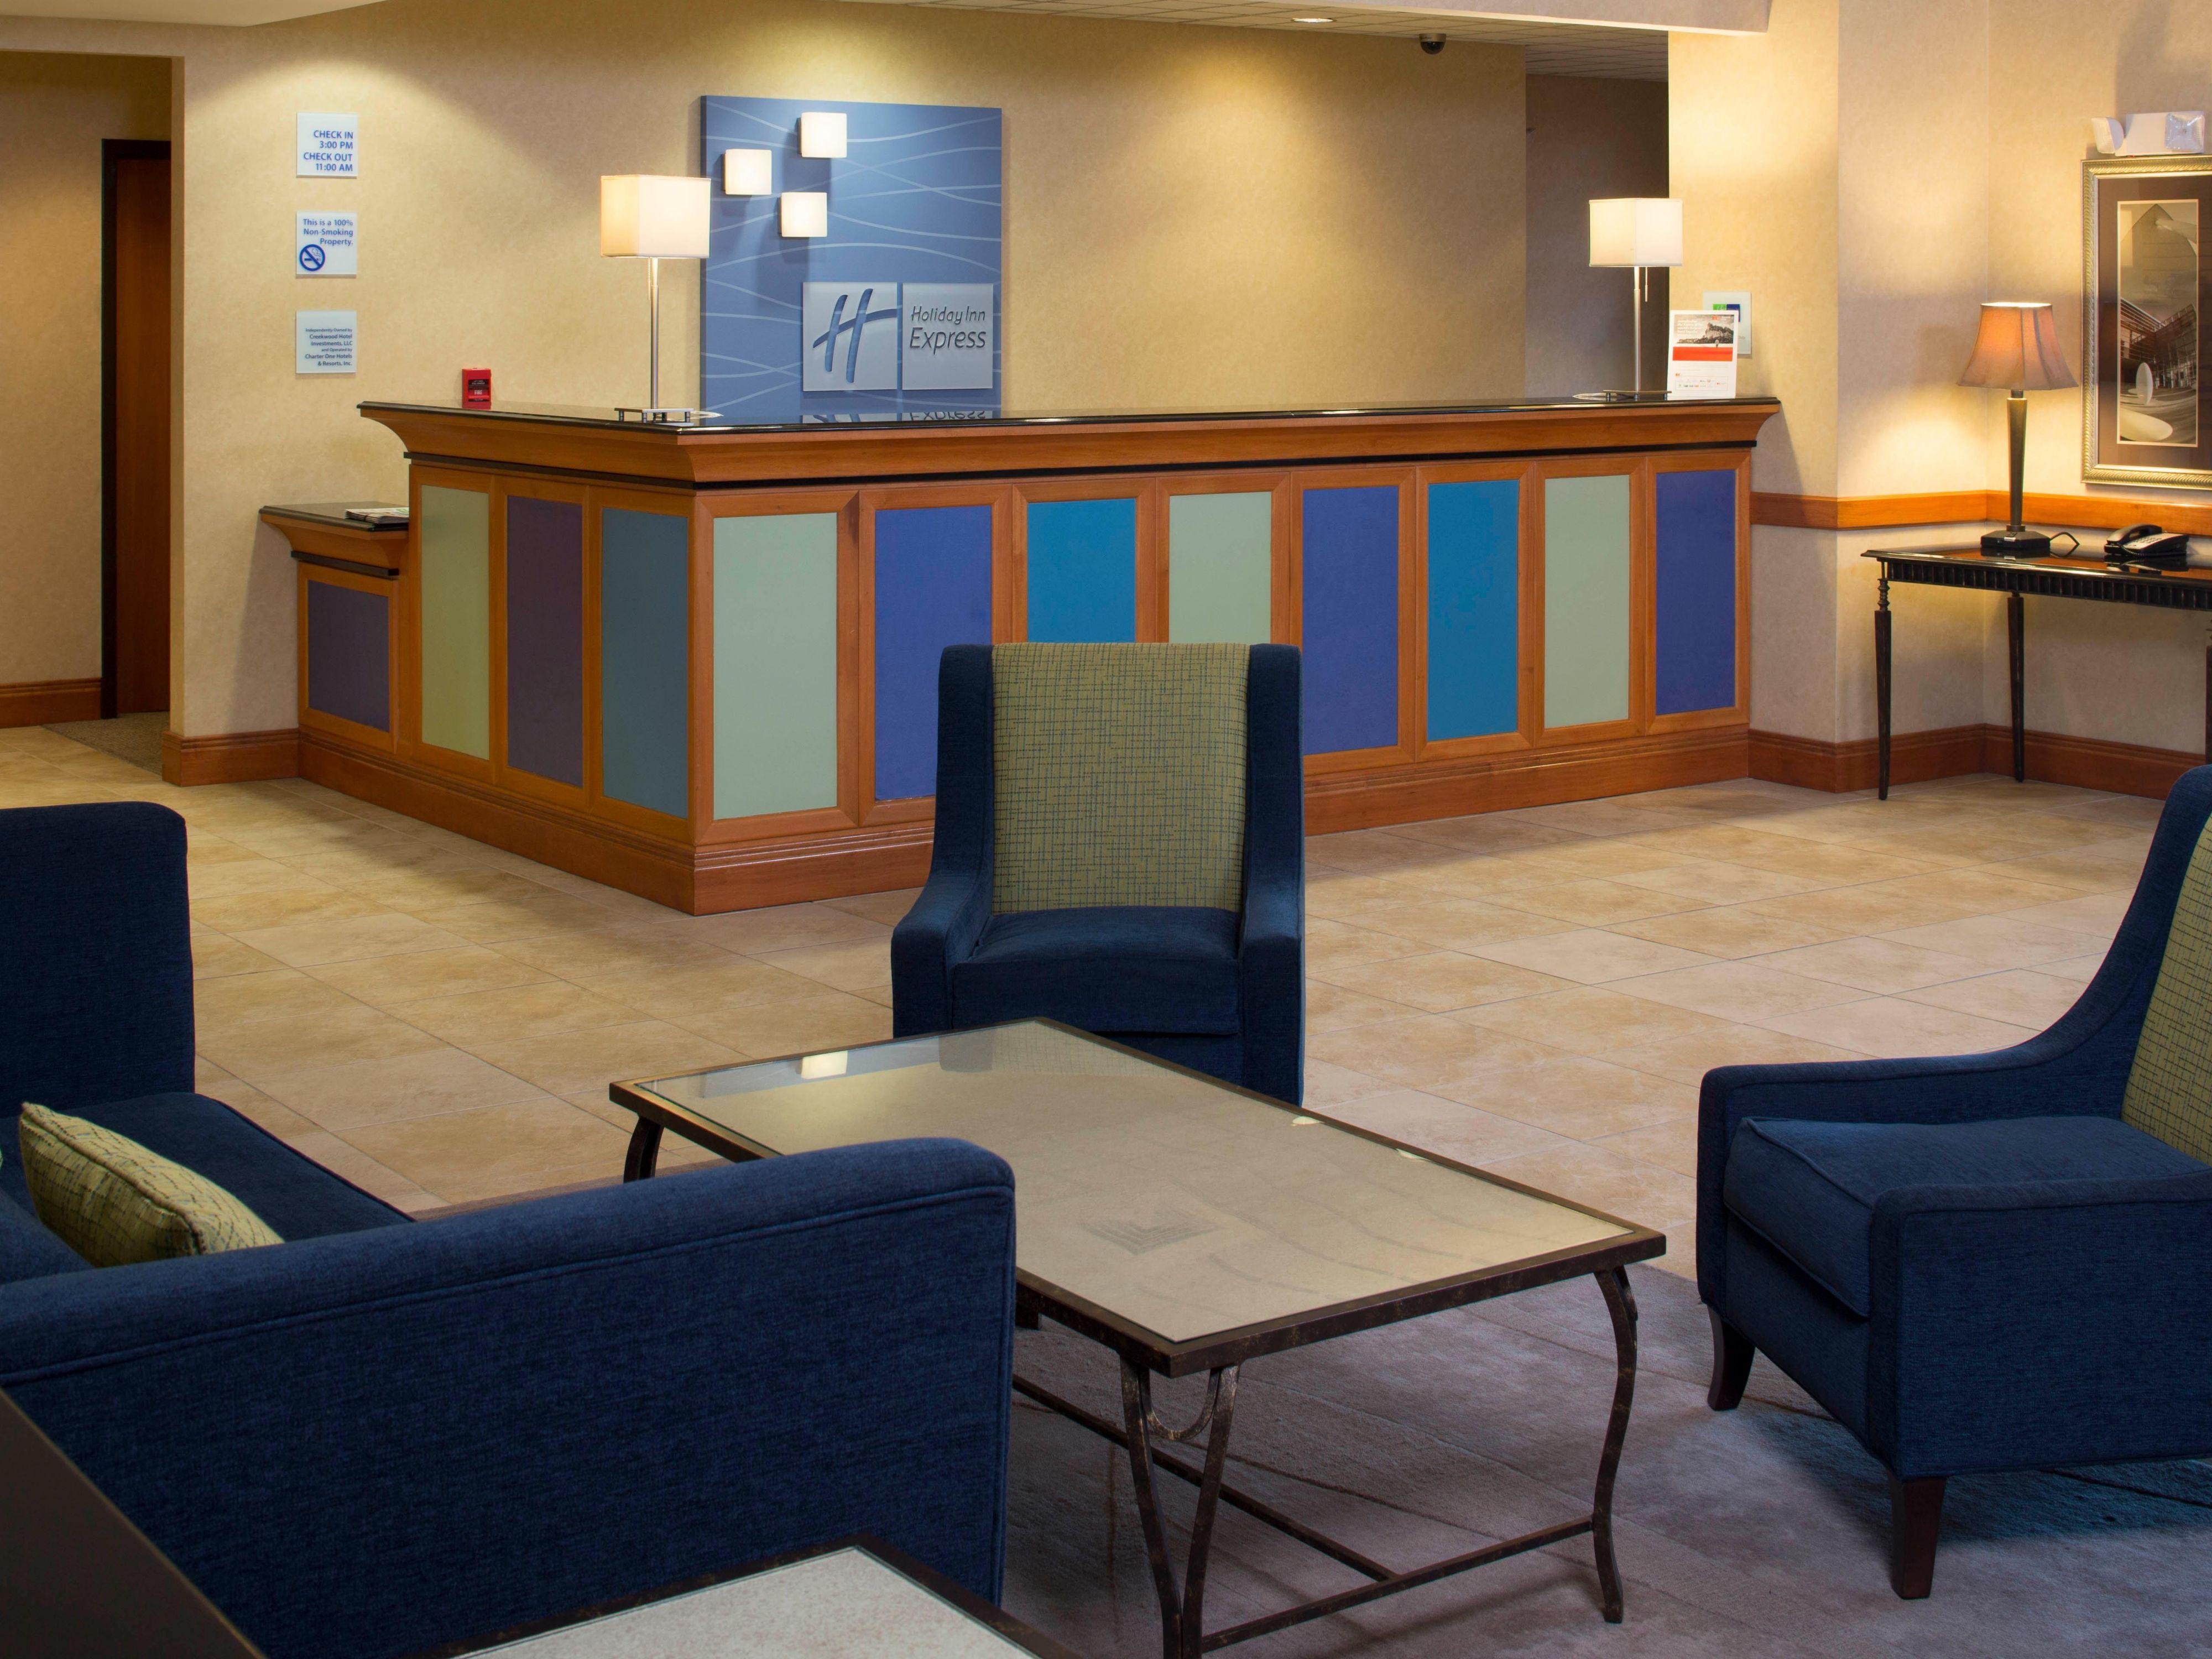 Holiday Inn Express Suites Bradenton East Lakewood Ranch Hotel By Ihg